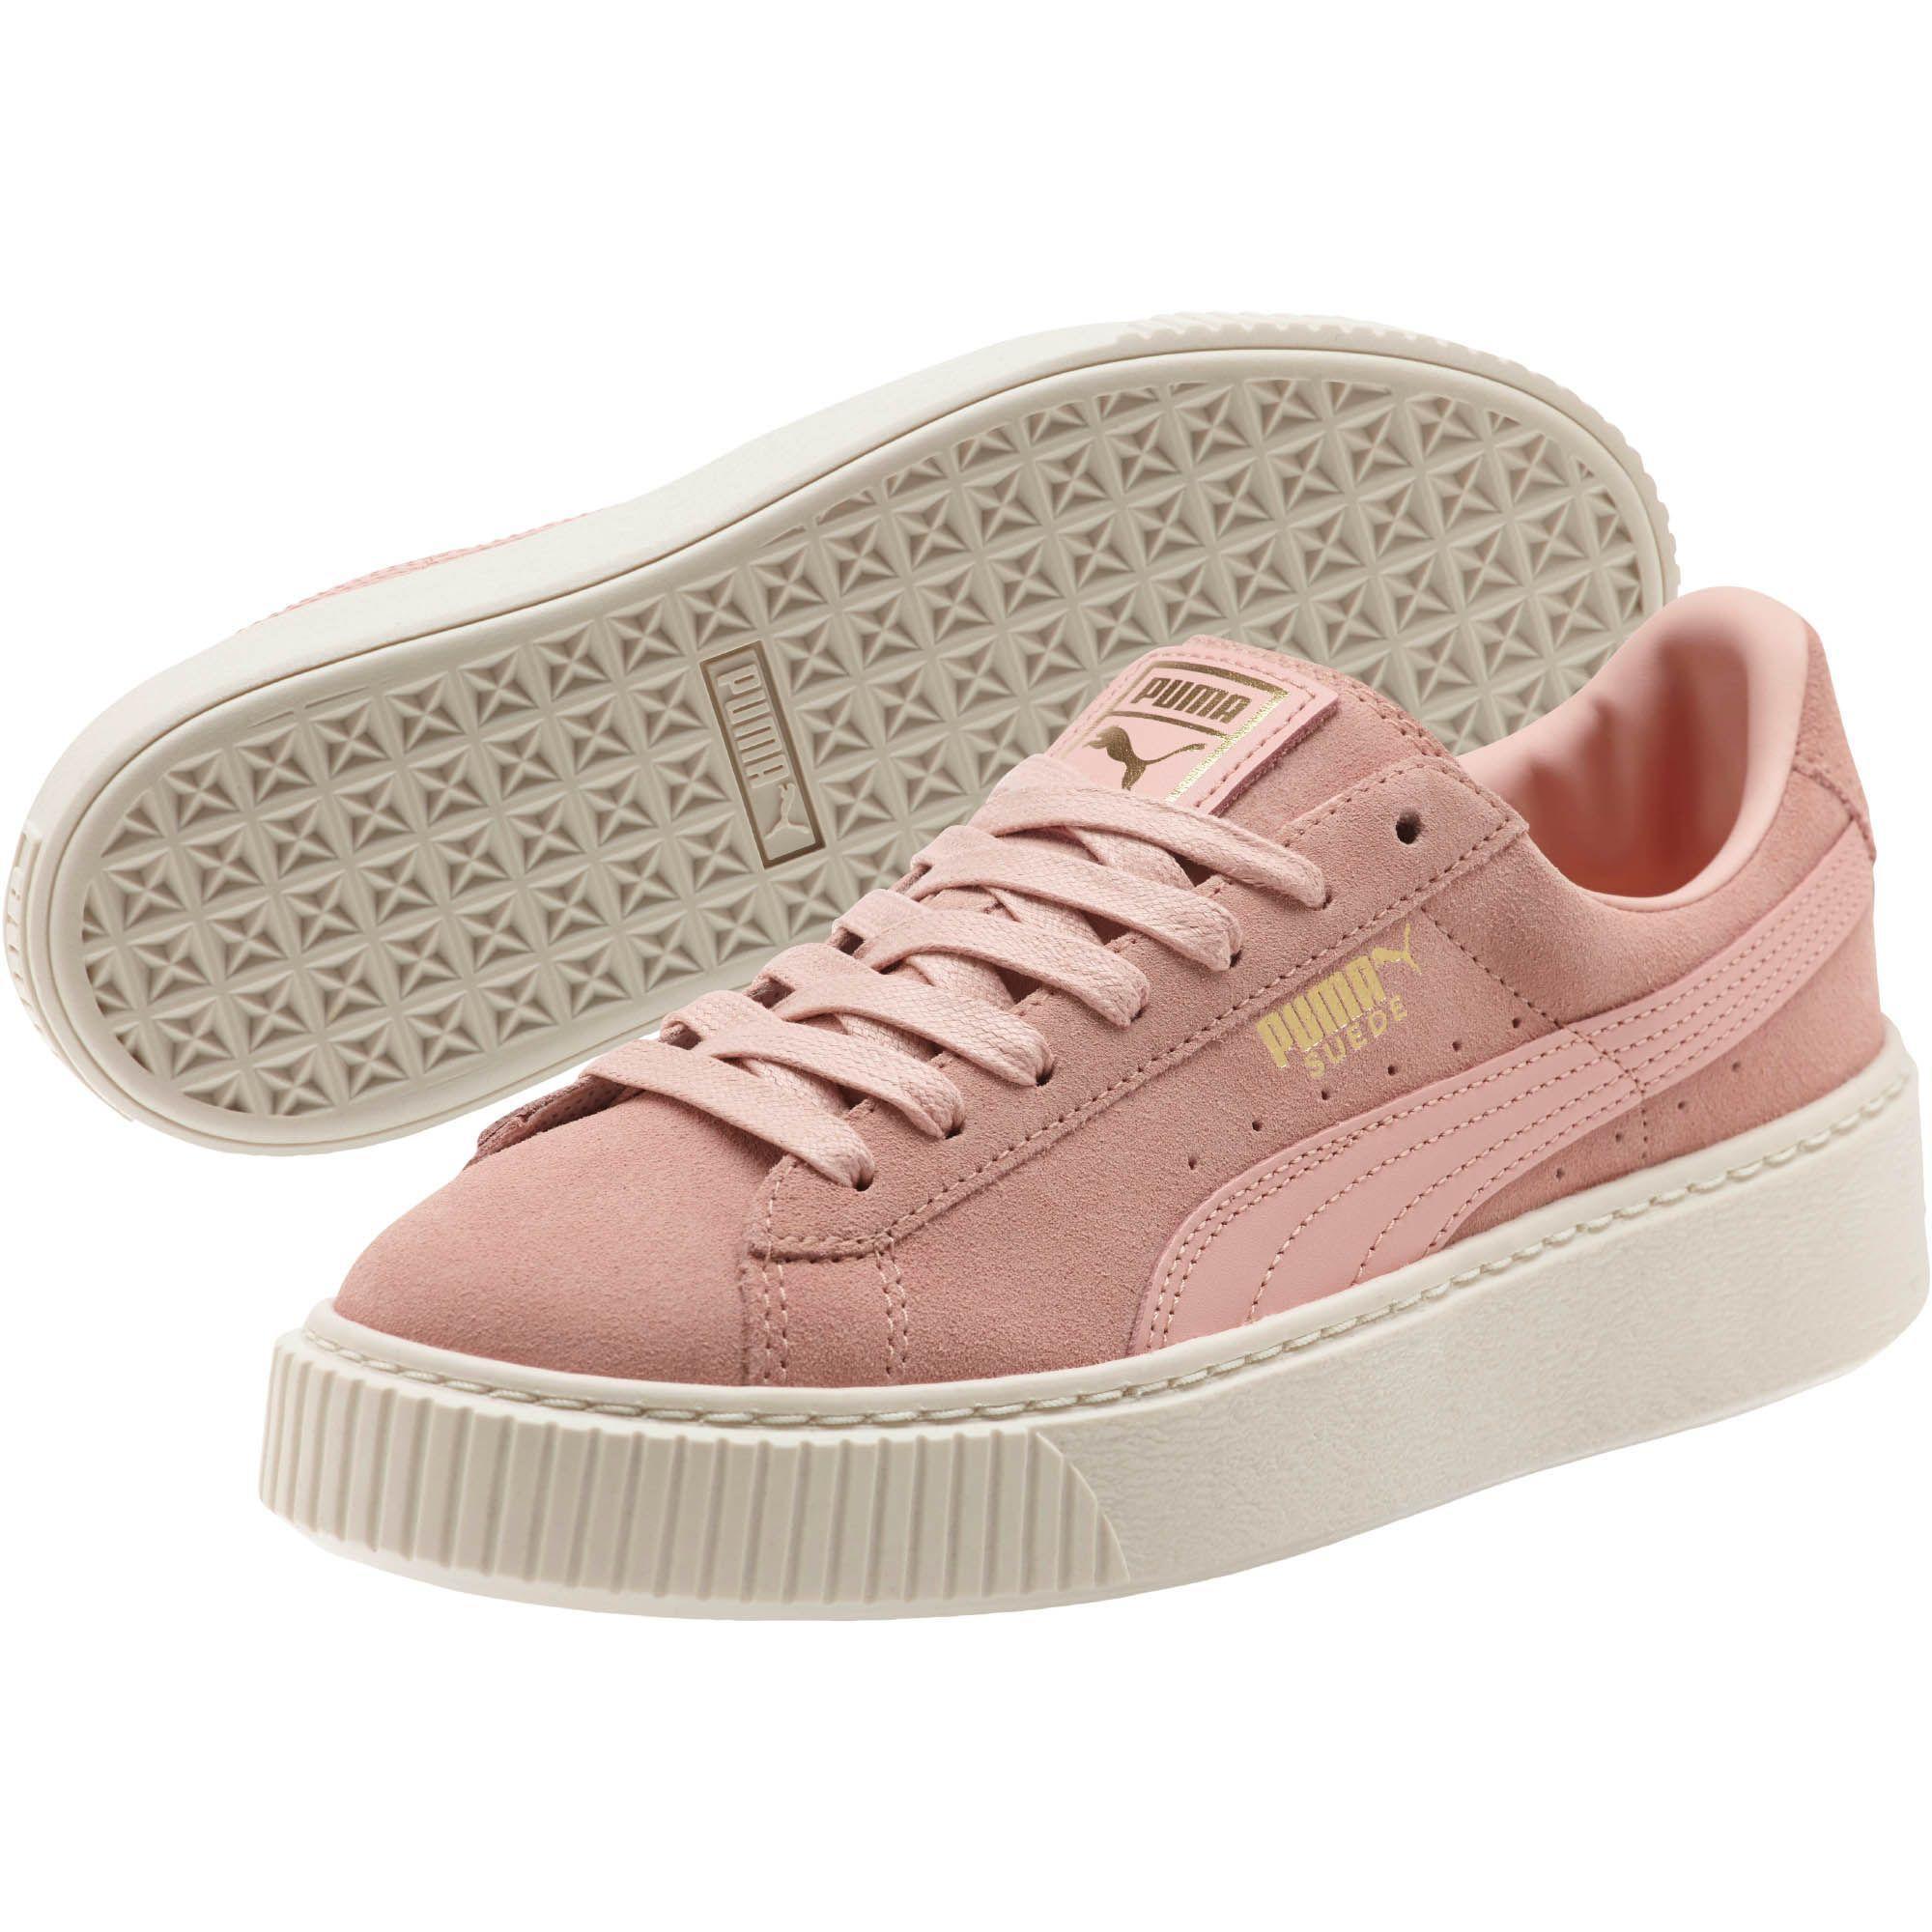 eaa9000a2c2 Lyst - PUMA Suede Platform Core Women s Sneakers in Pink